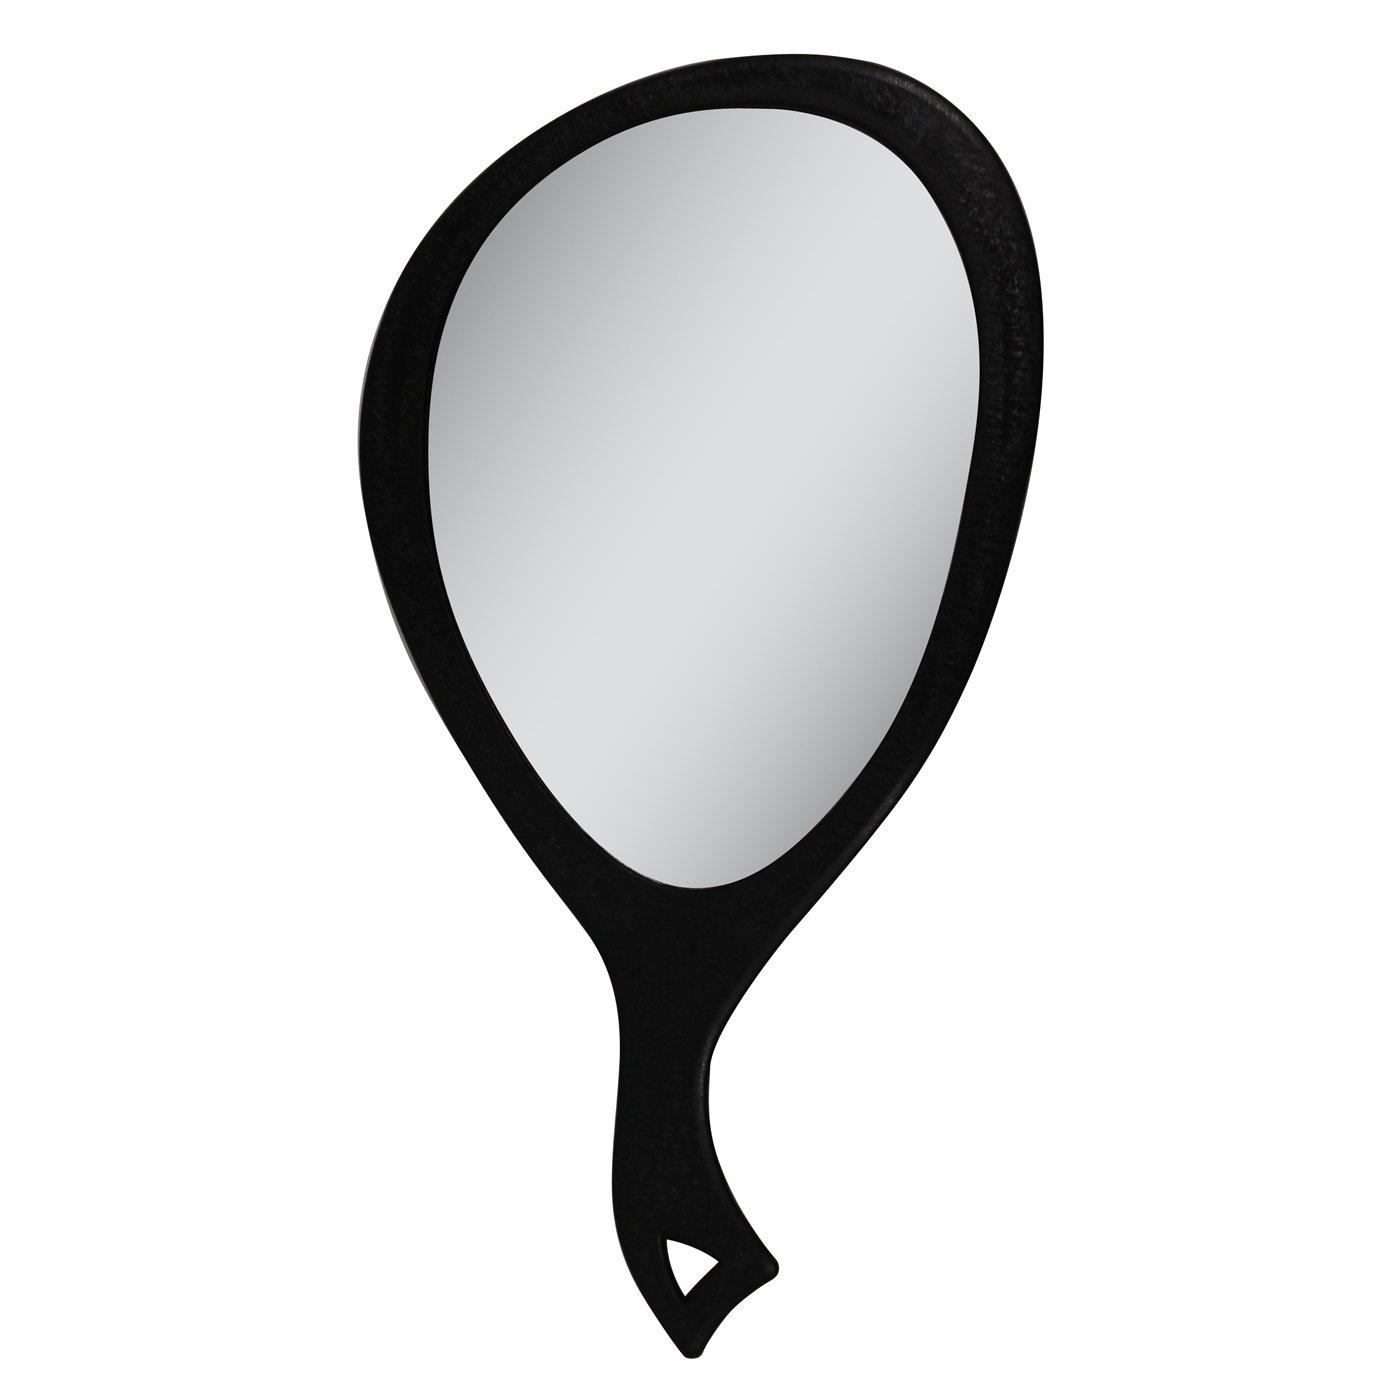 Hand Mirror Clipart.